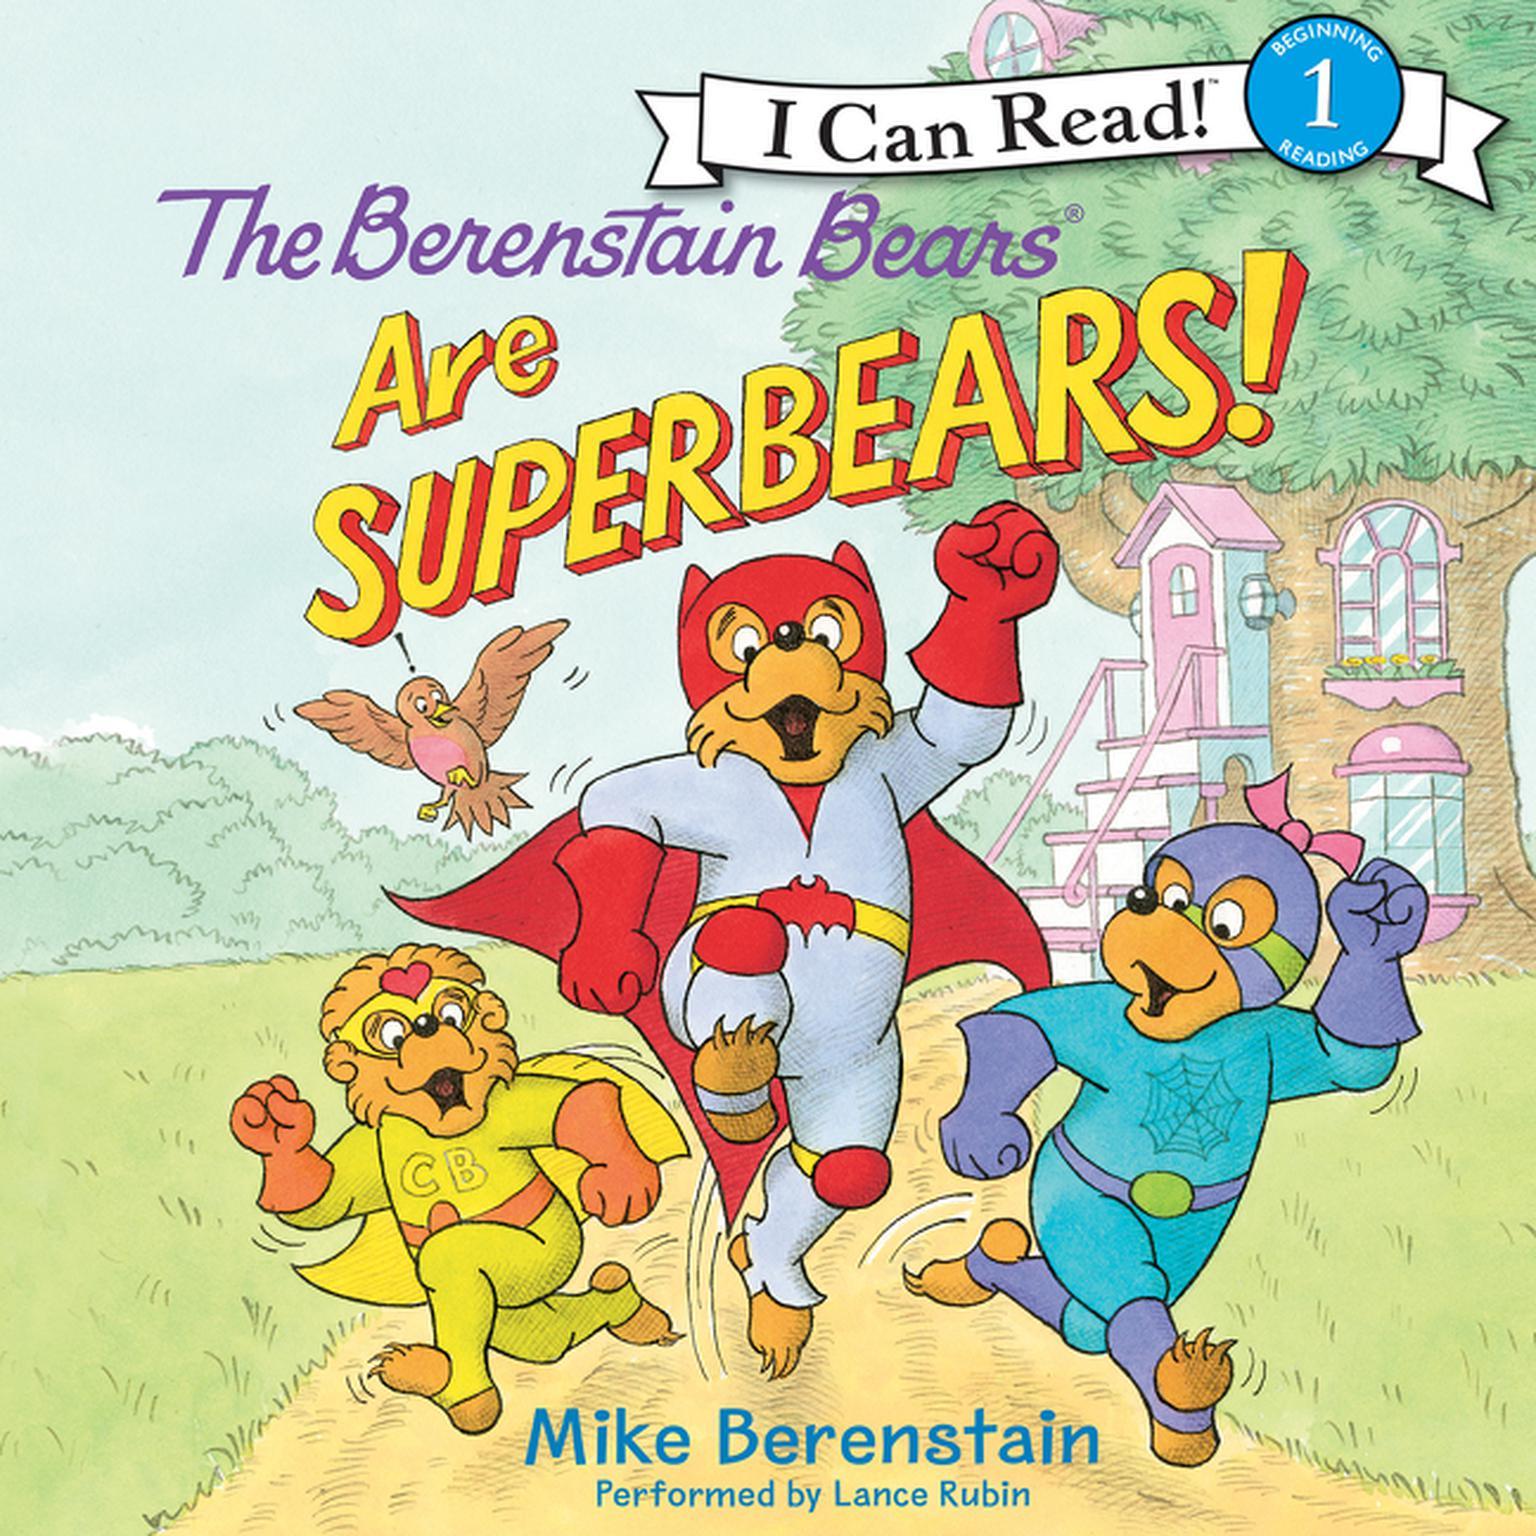 The Berenstain Bears Are Superbears